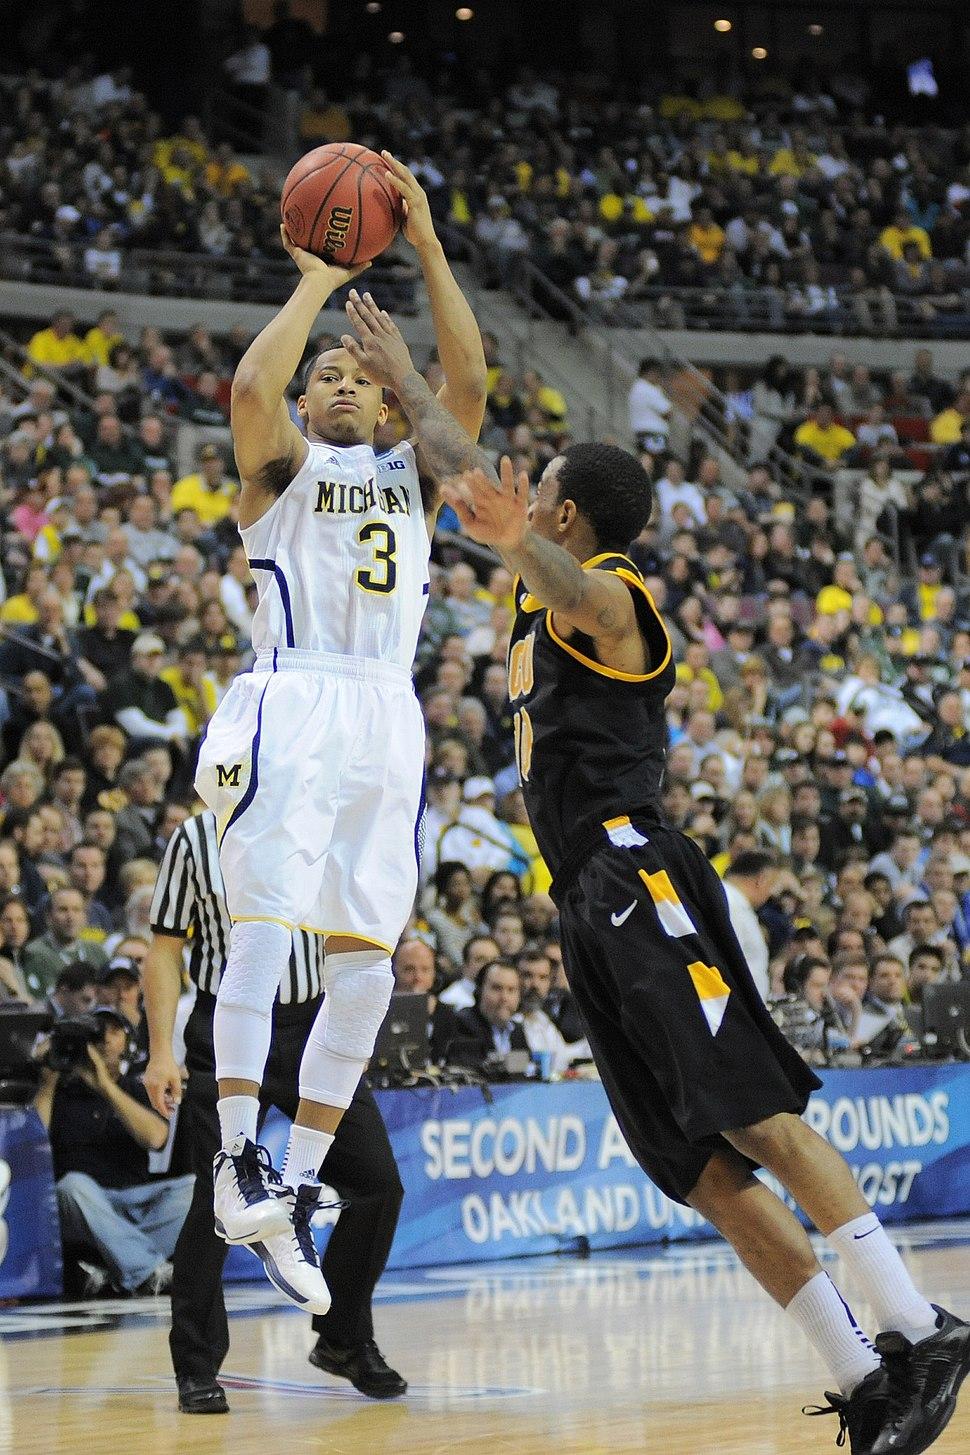 20130323 Trey Burke shooting during NCAA tournament